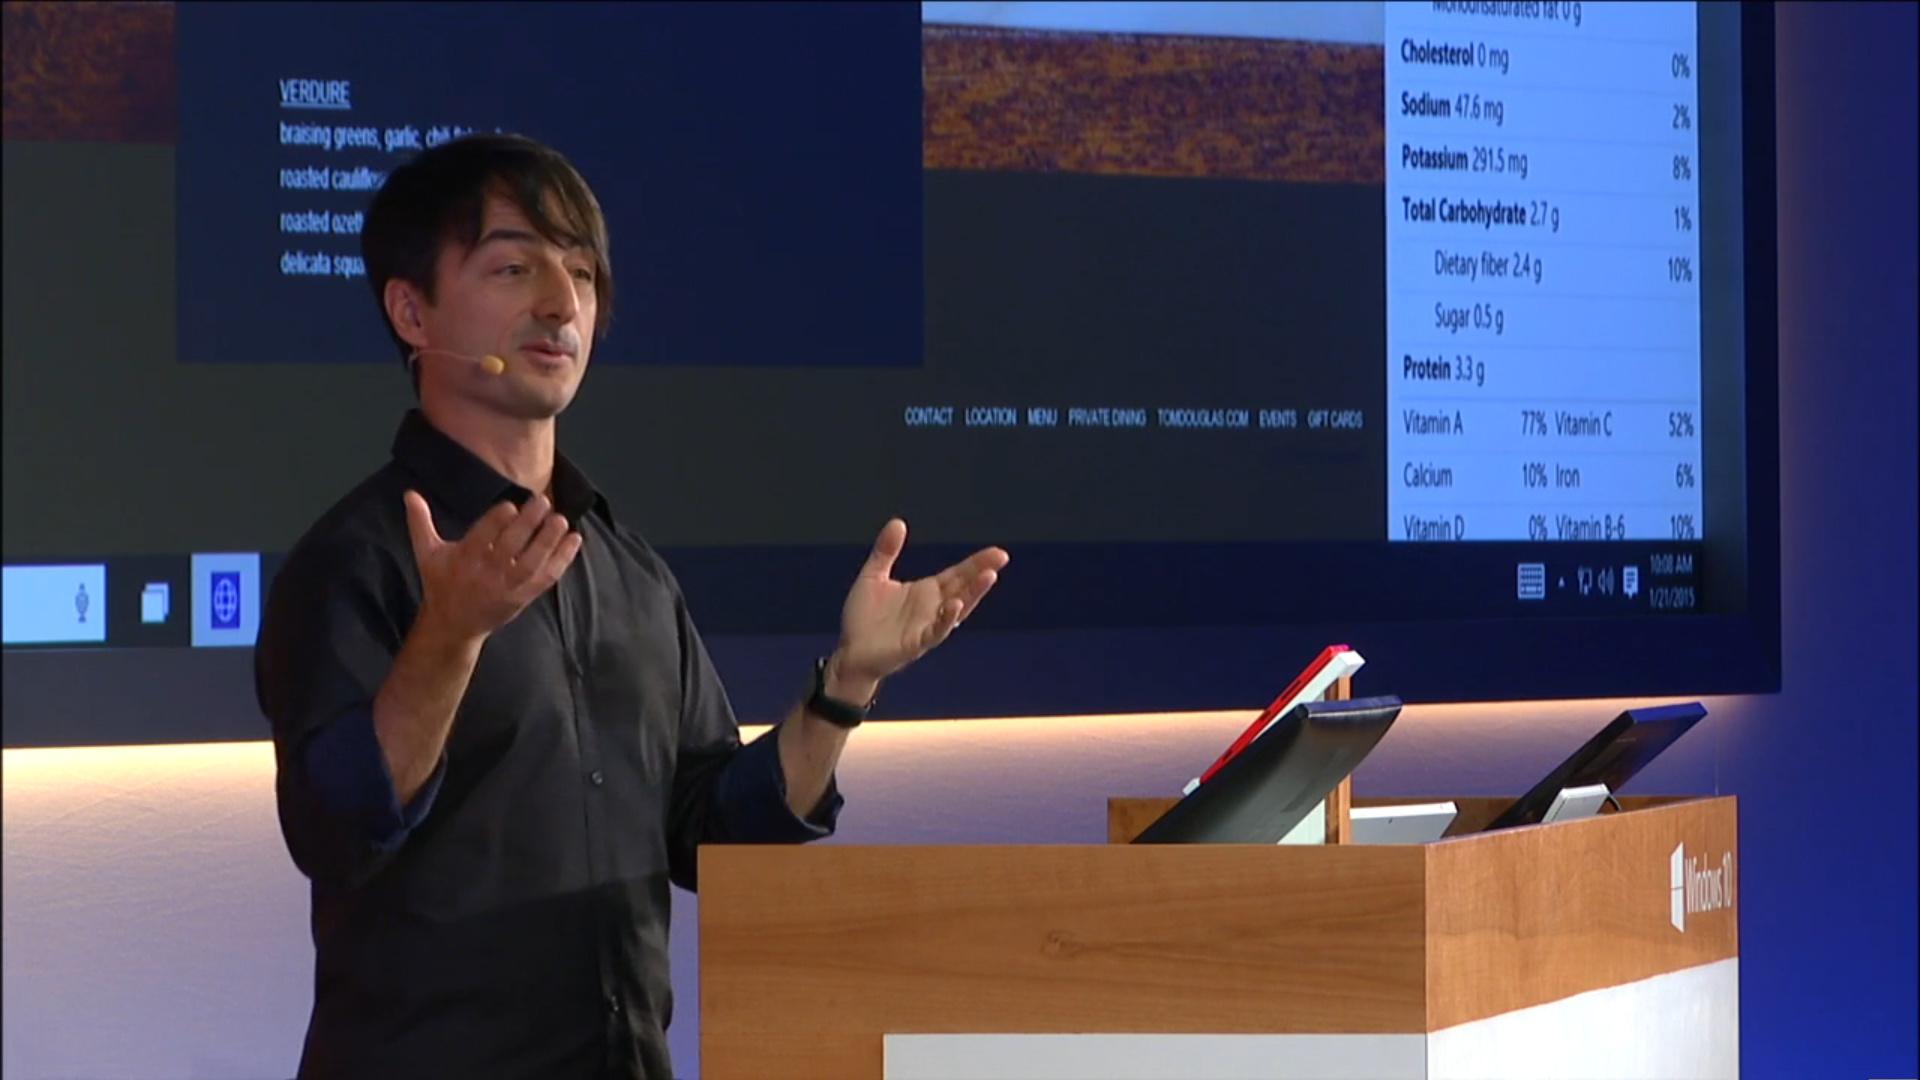 Project Spartan: Cortana